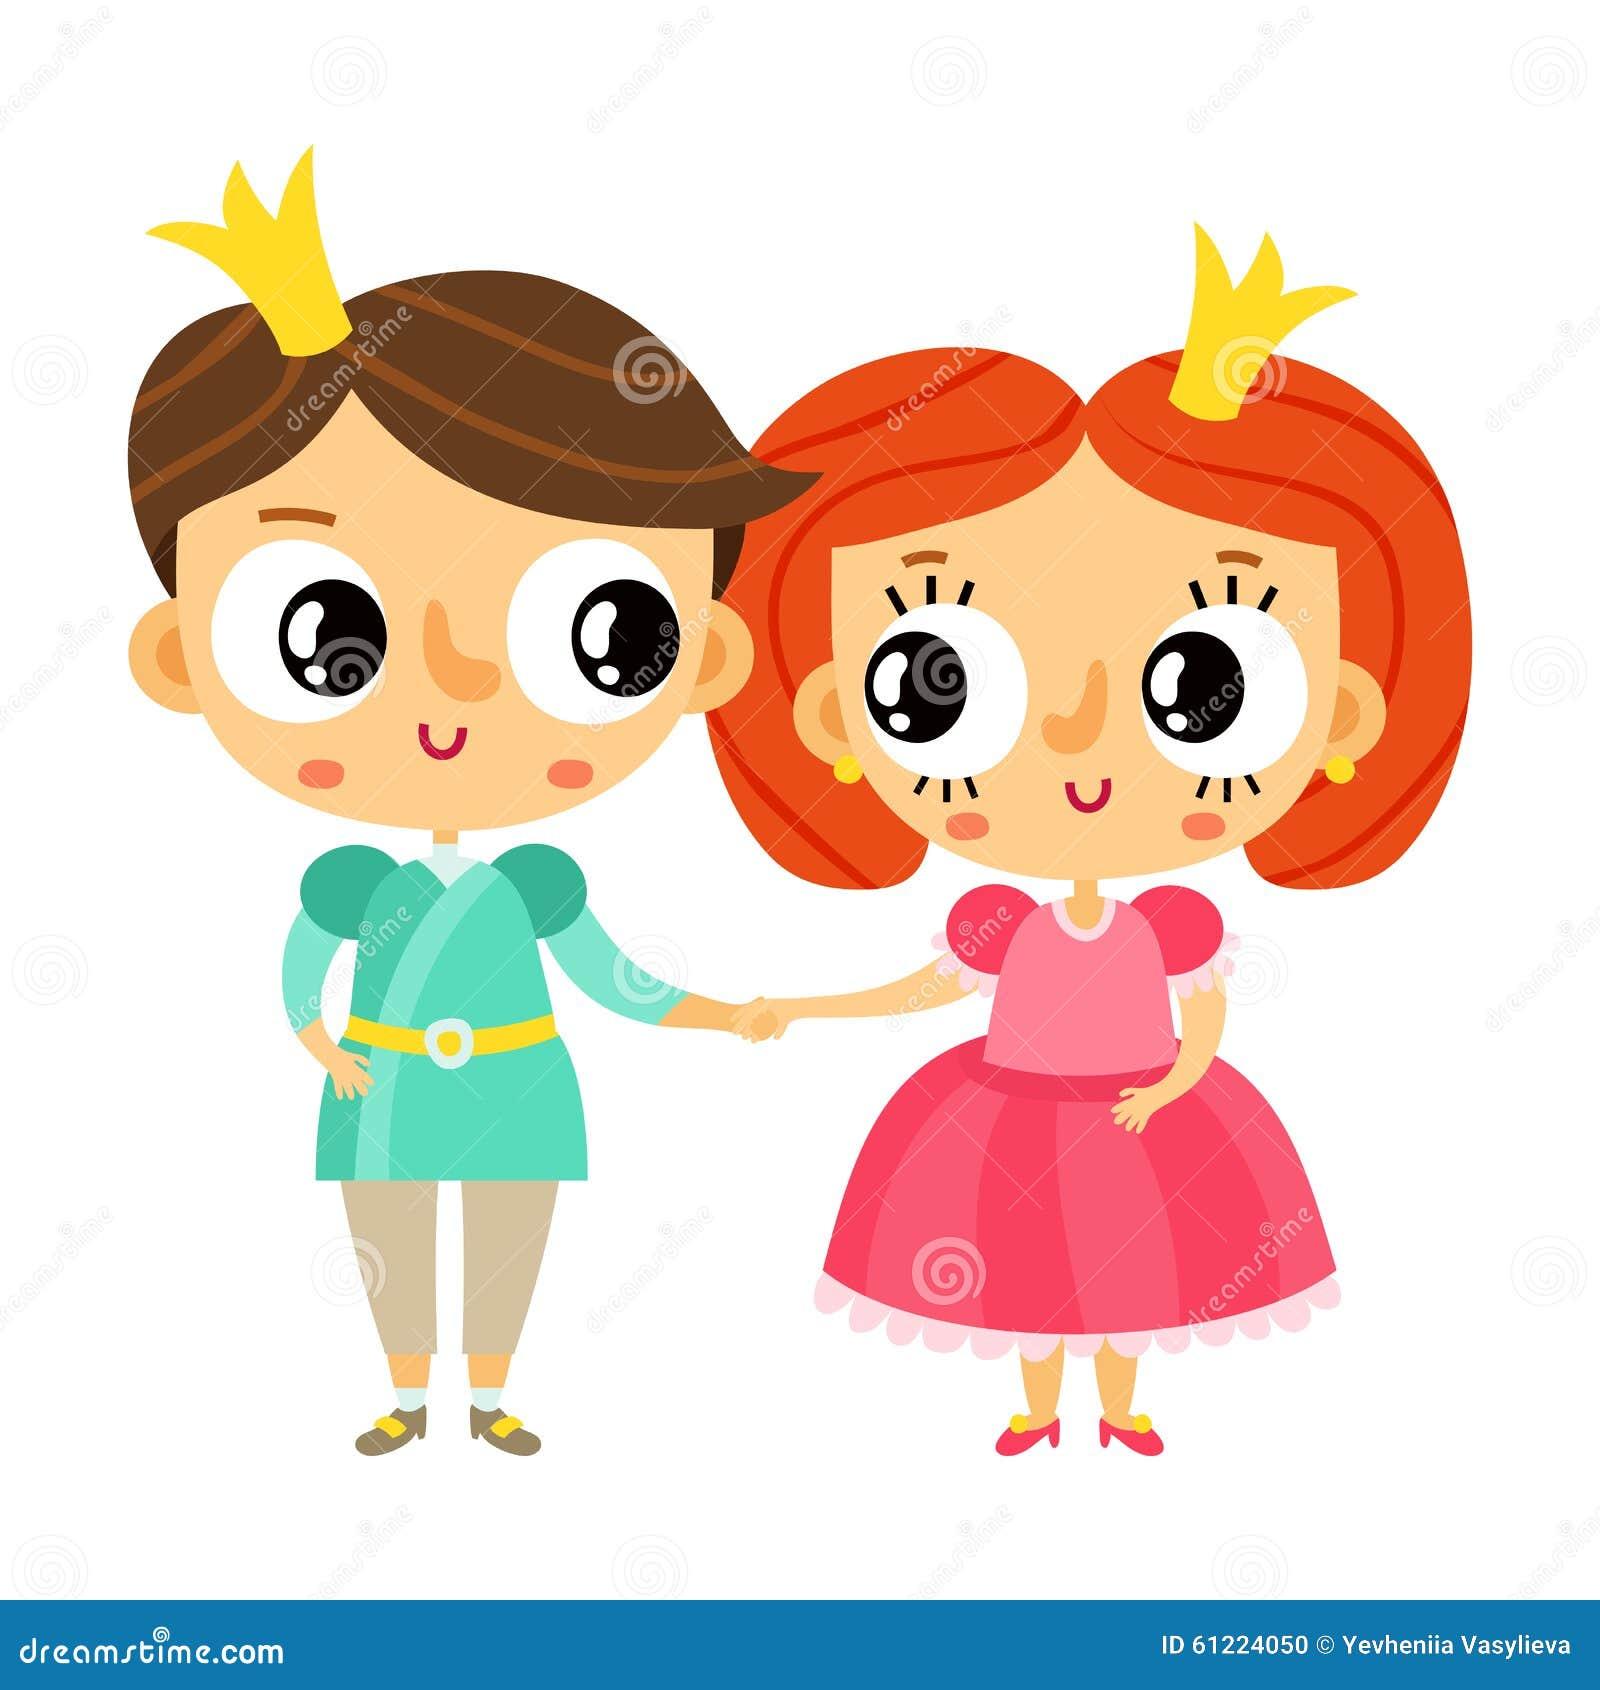 Cartoon Characters Holding Hands : Cartoon character royal princess stock illustration